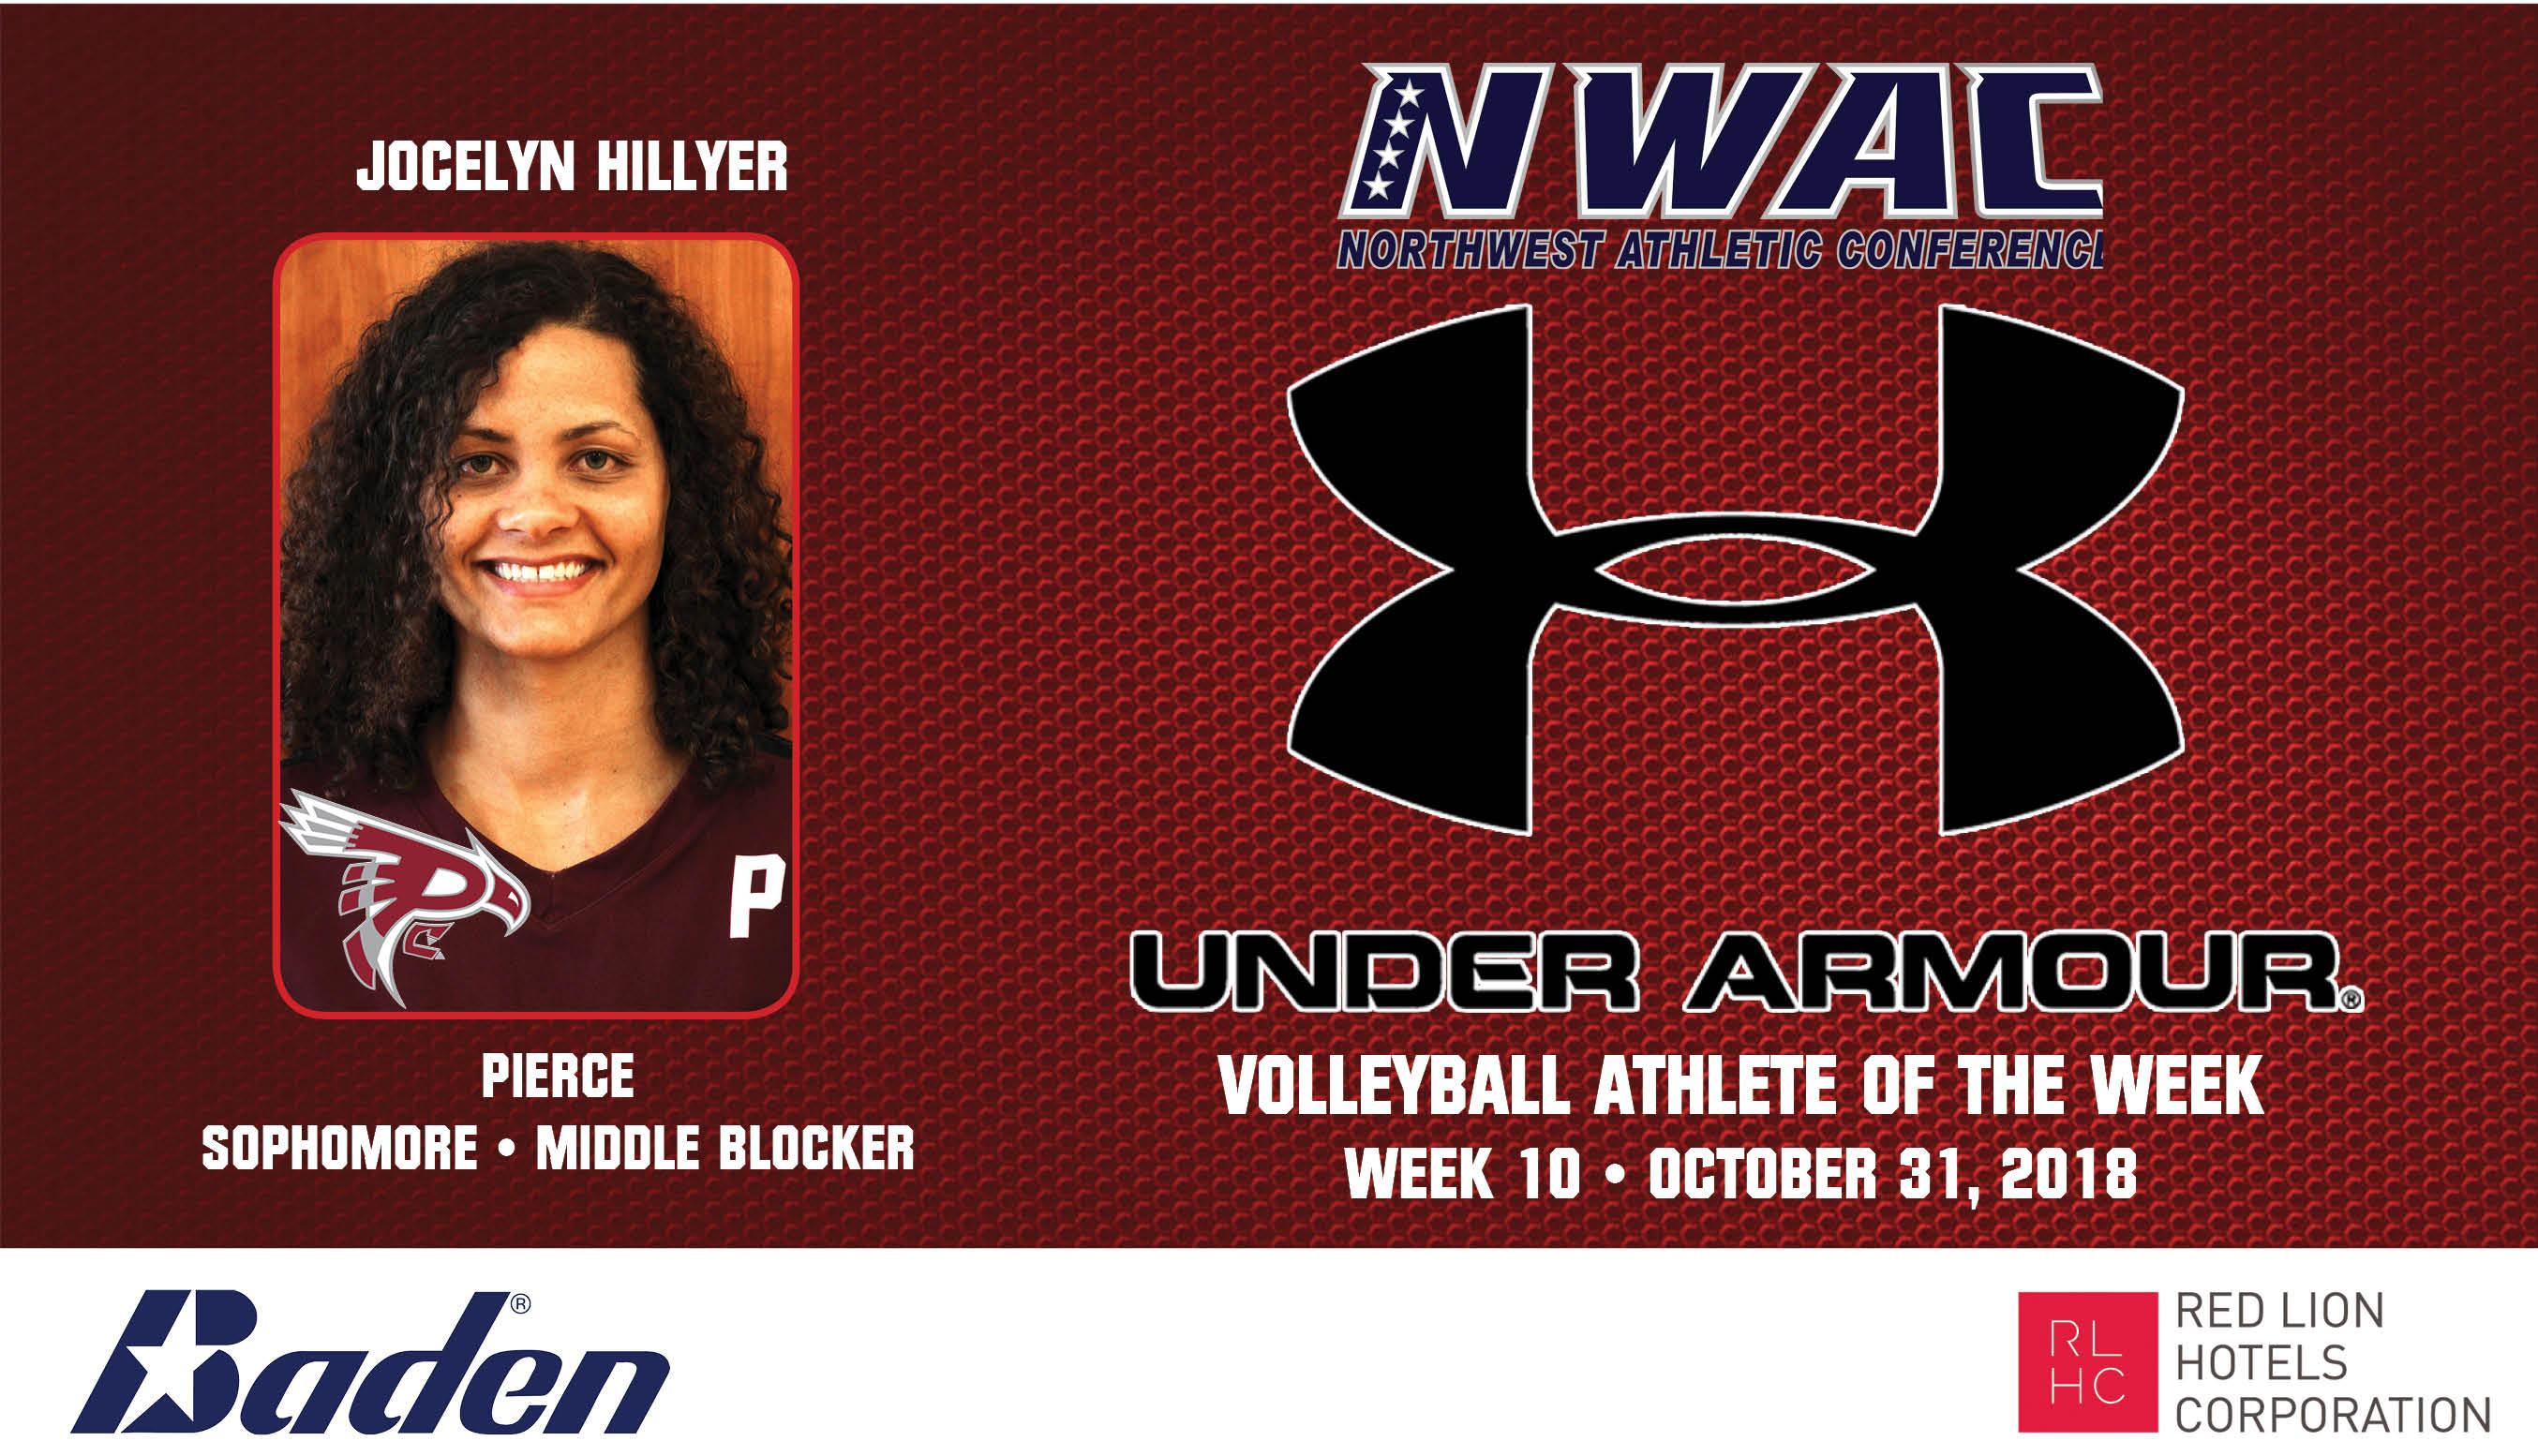 Jocelyn Hillyer Under Armour Photo Banner